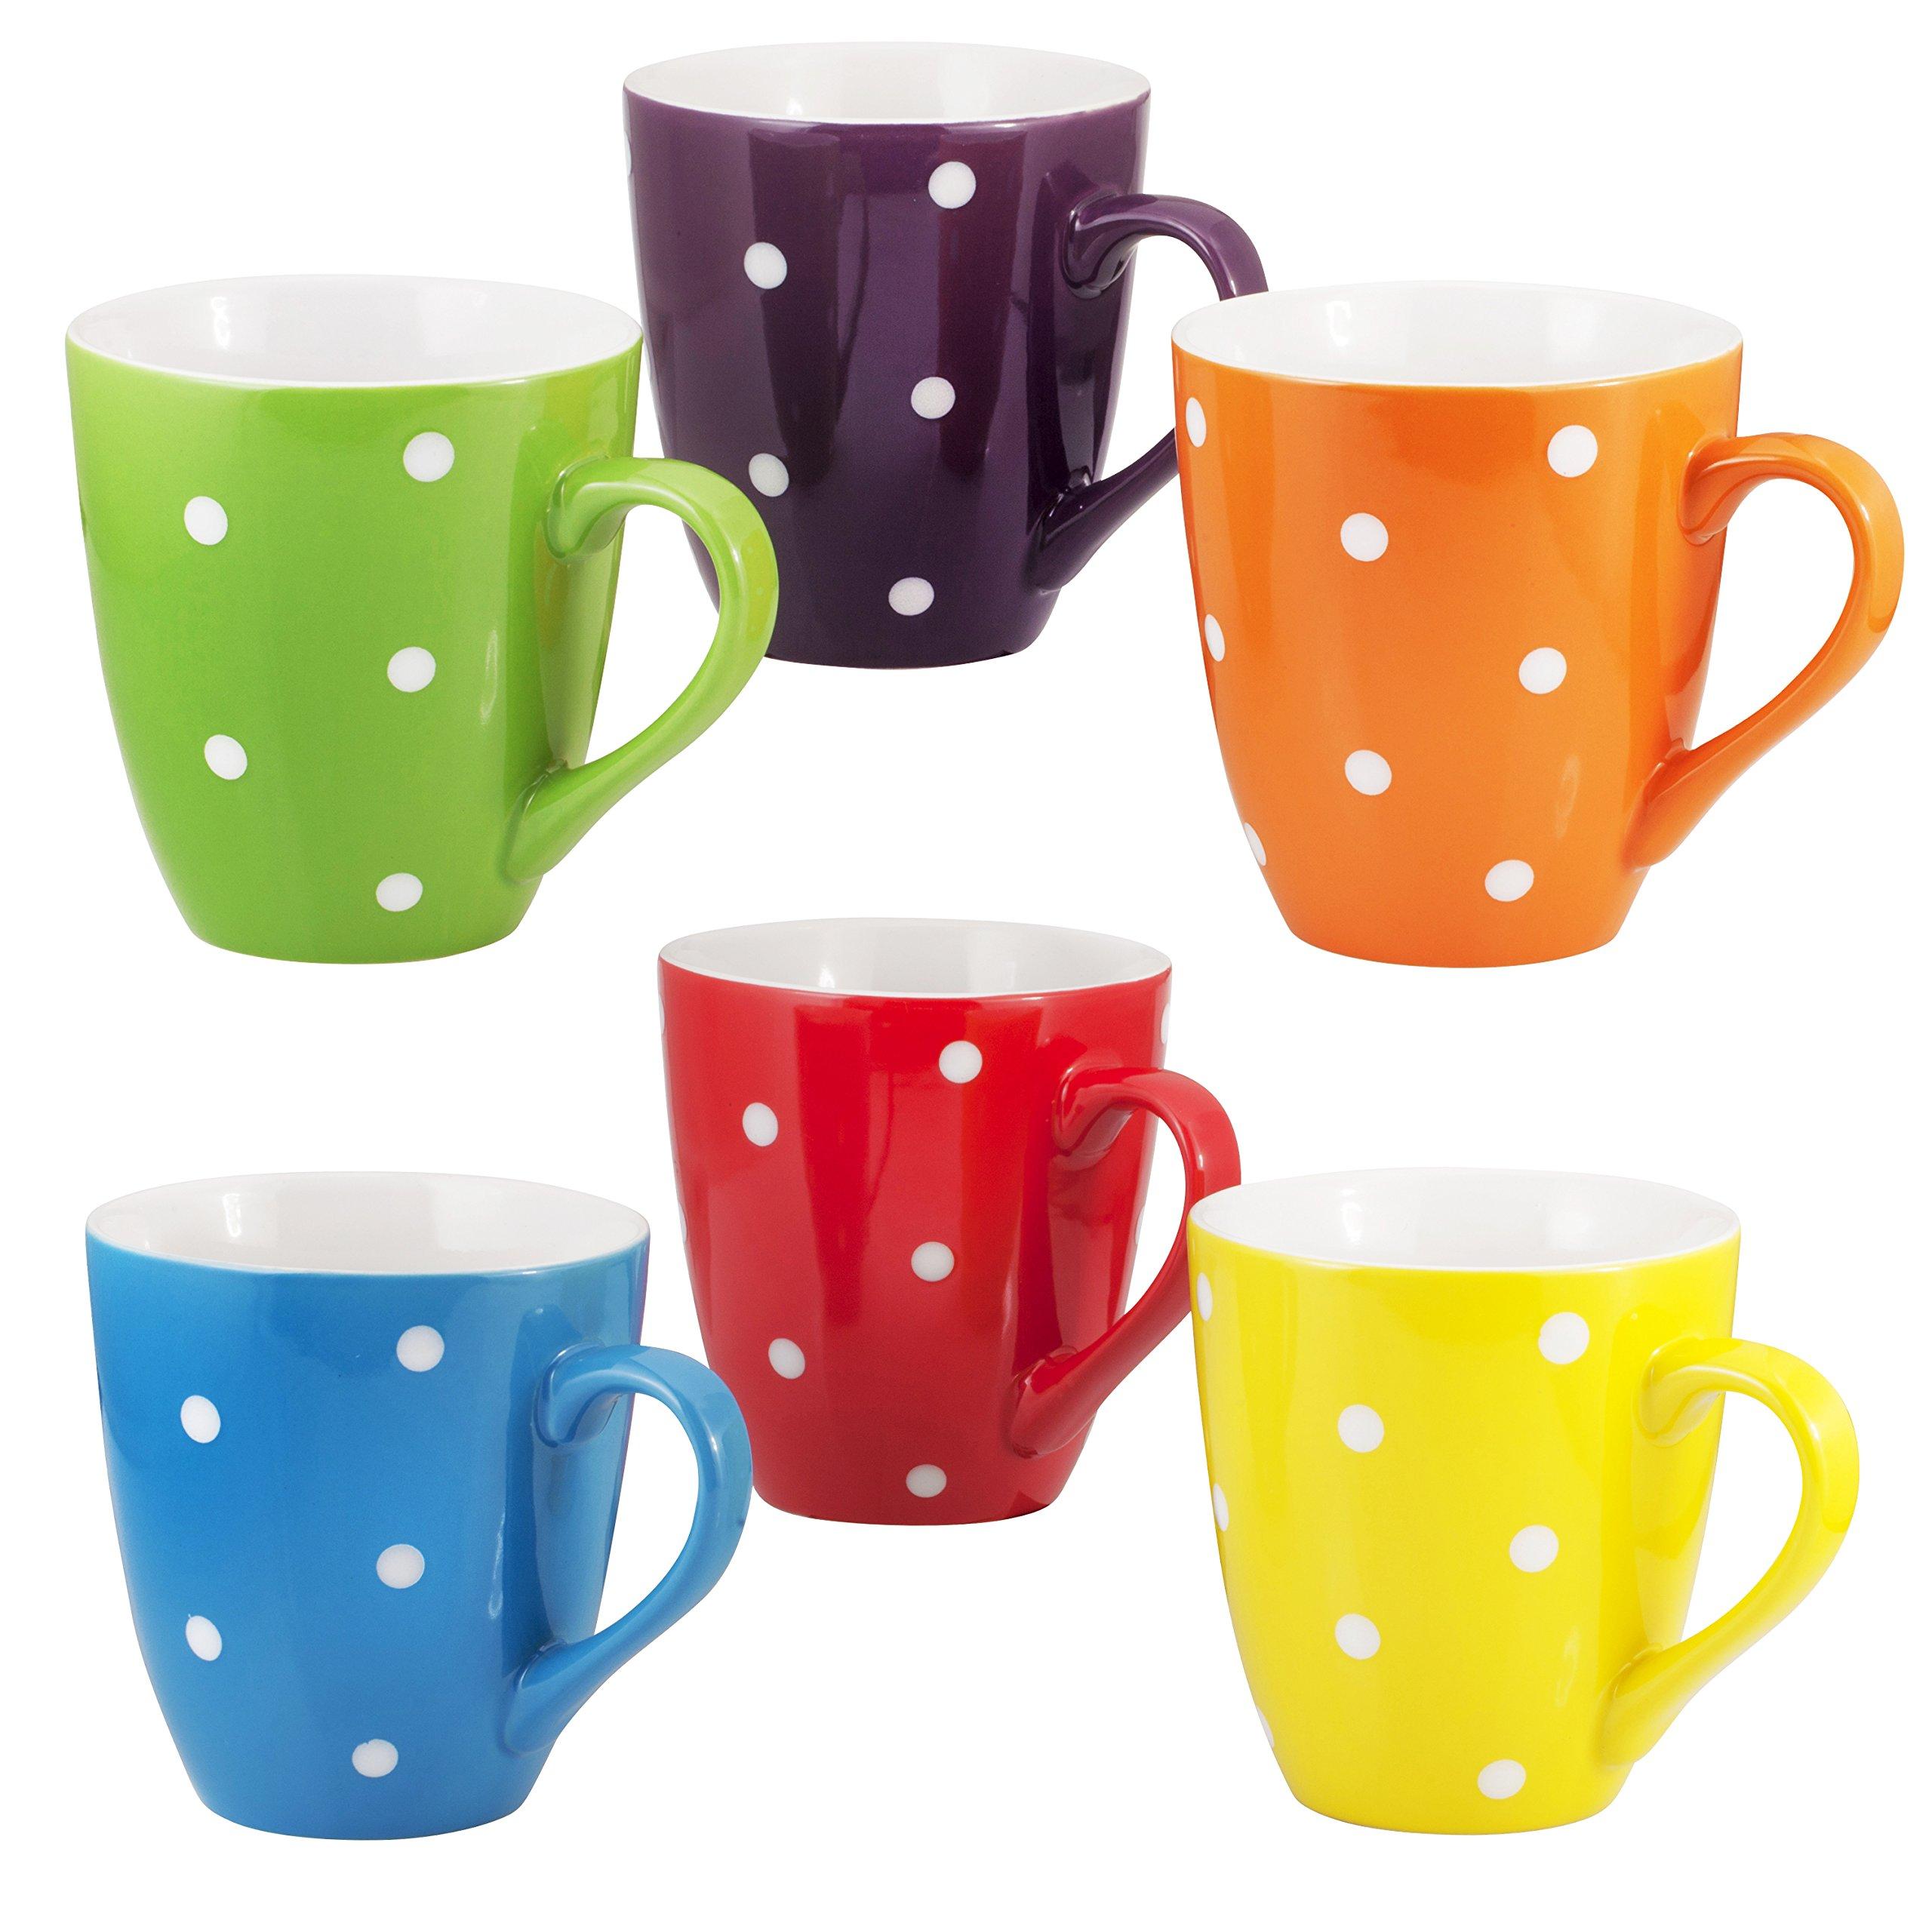 Coffee Mug Set Set of 6 Large-sized 16 Ounce Ceramic Coffee Mugs Restaurant Coffee Mugs By Bruntmor (Polka Dot) by Bruntmor (Image #6)